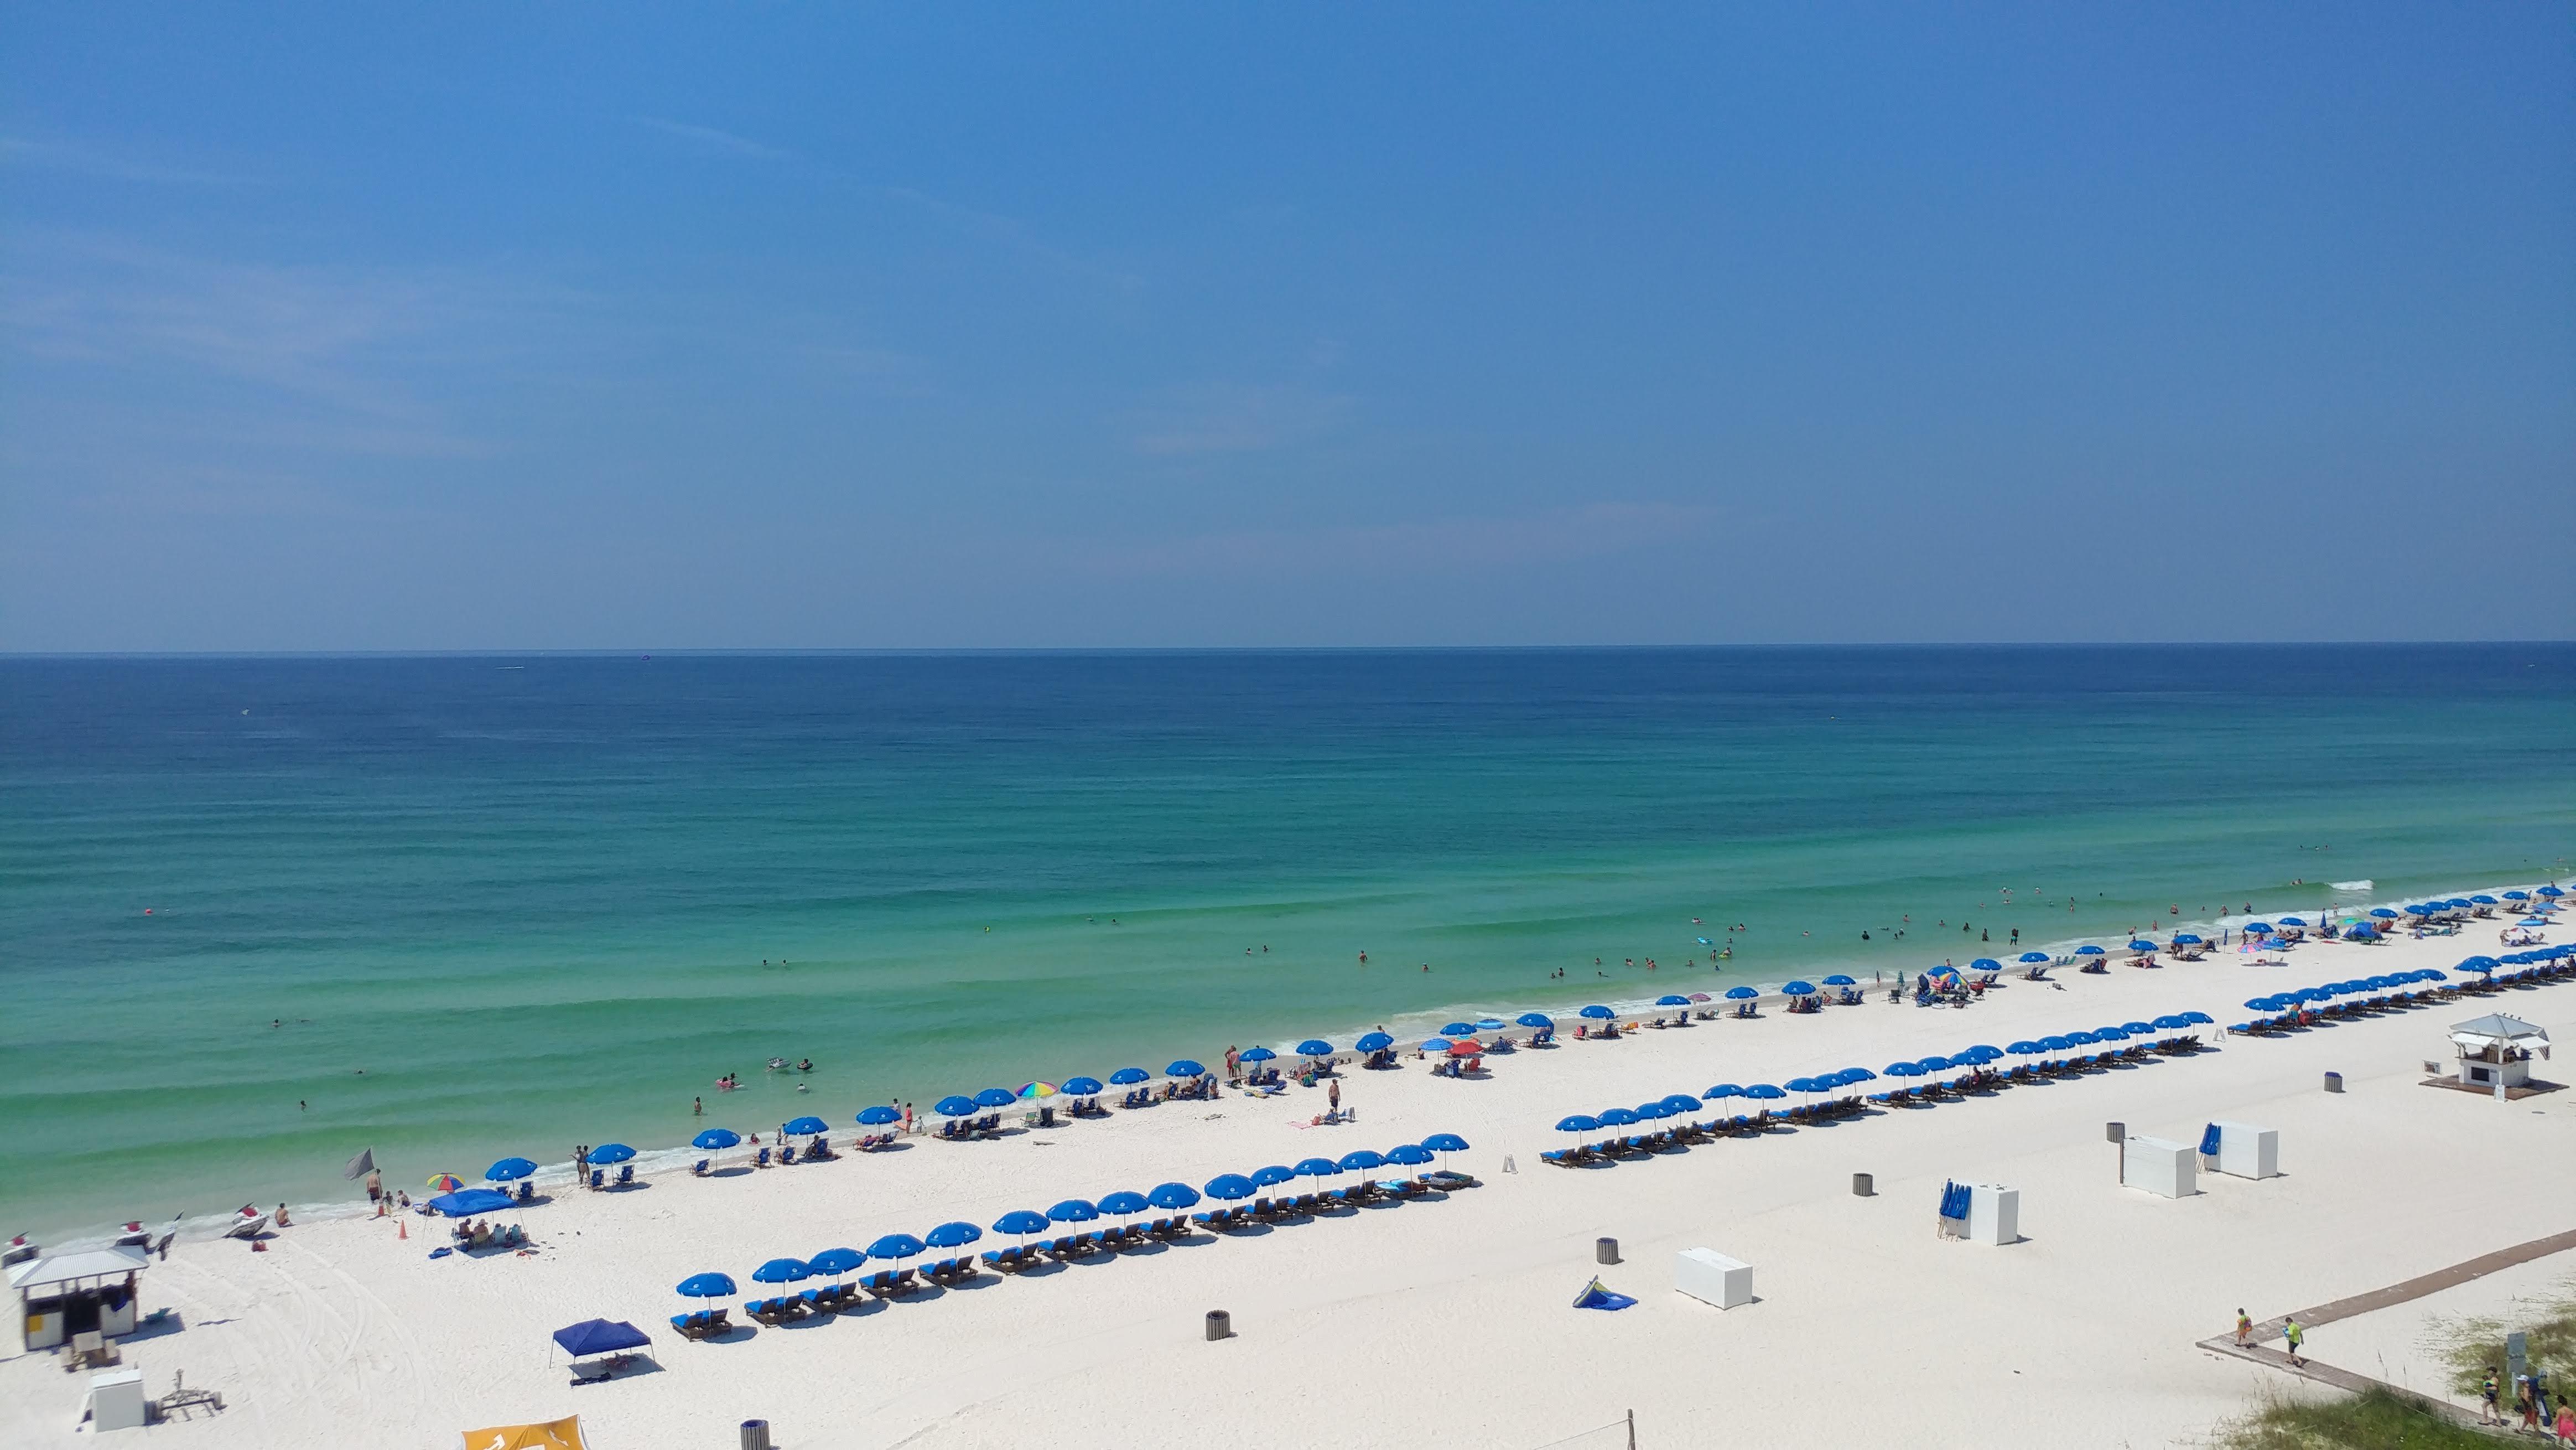 Aerial view of white sand beaches